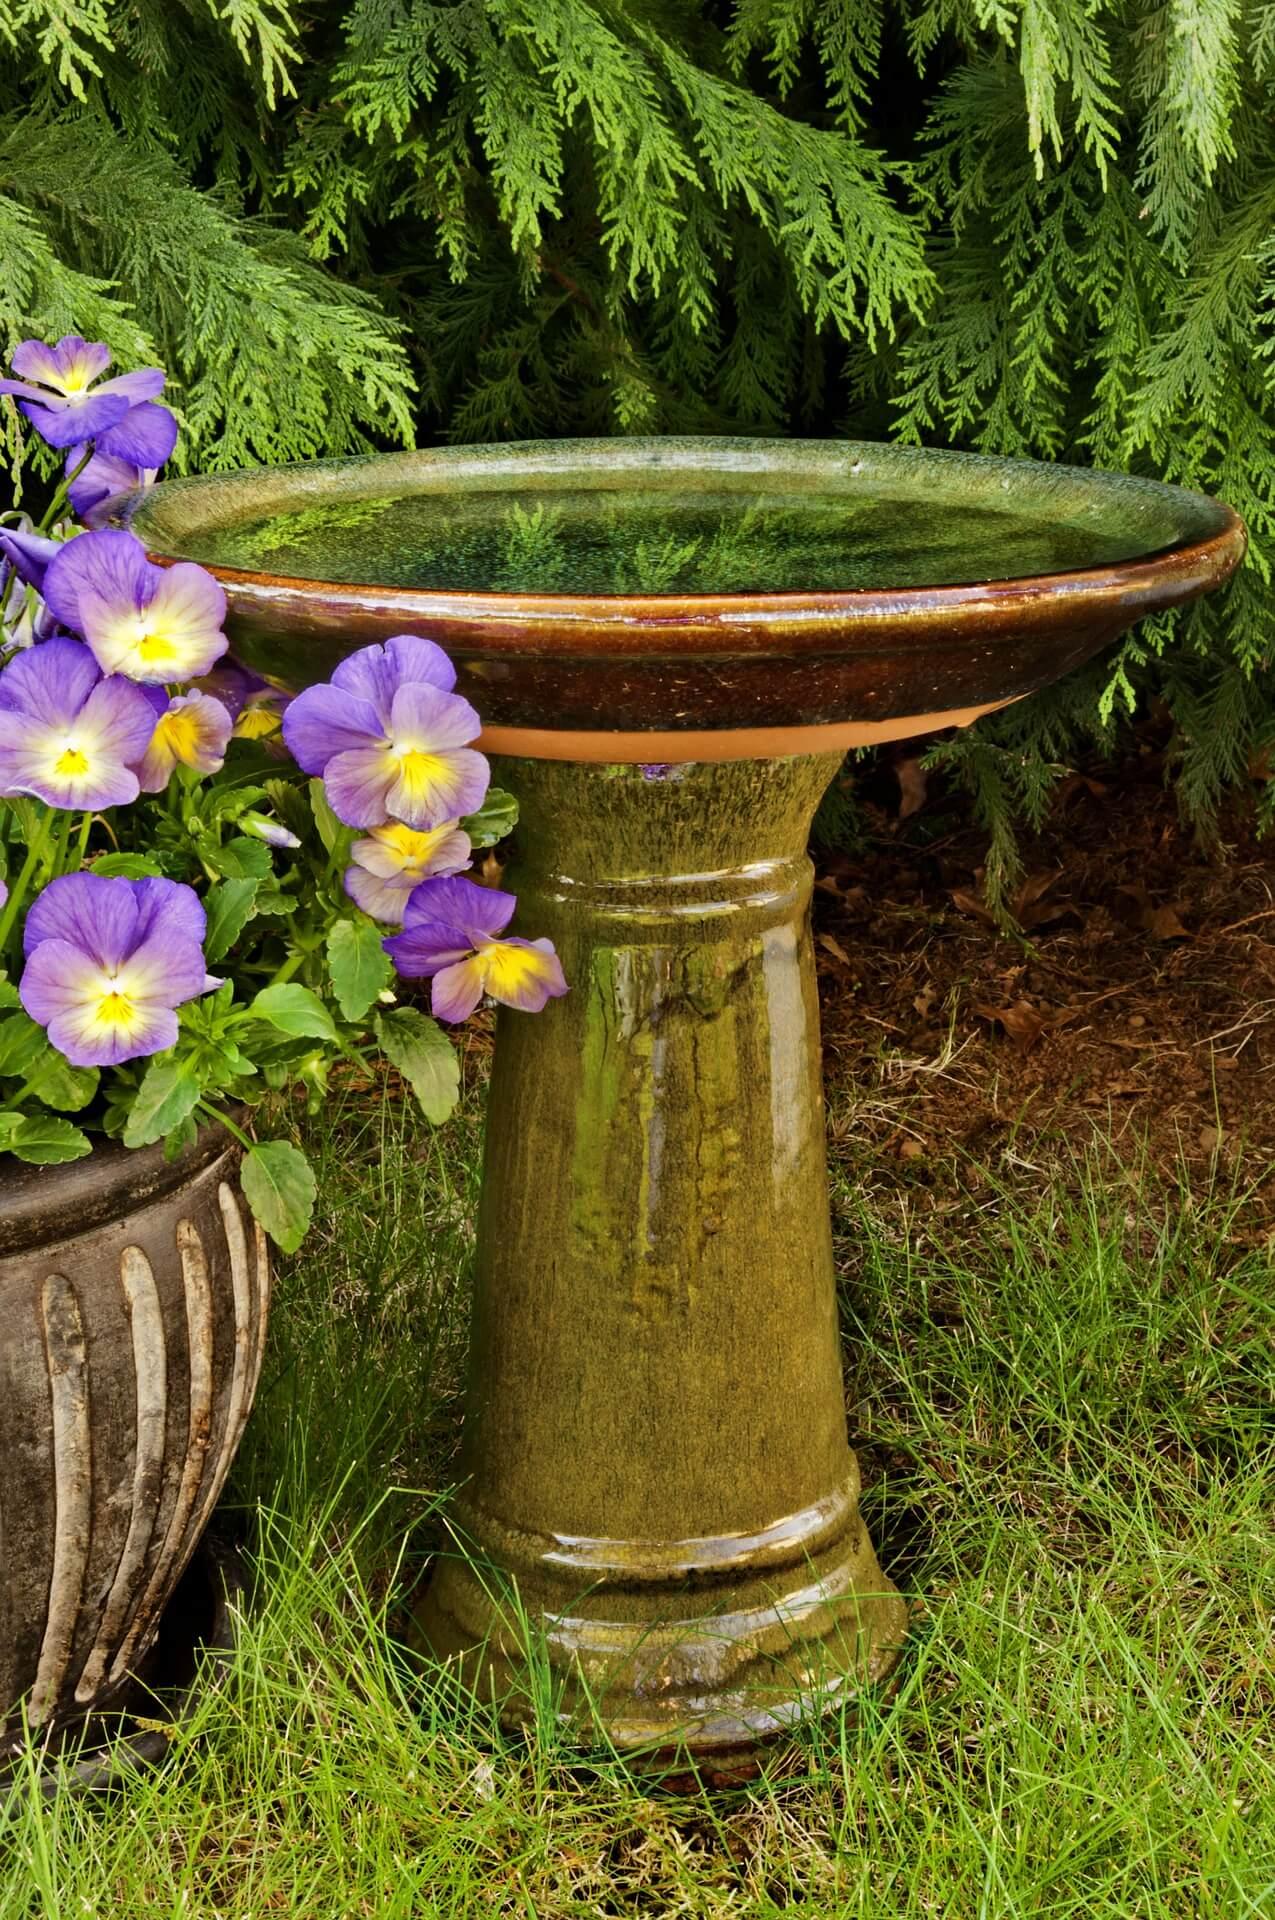 Plan your spring garden redesign ace of gray for Redesign your garden